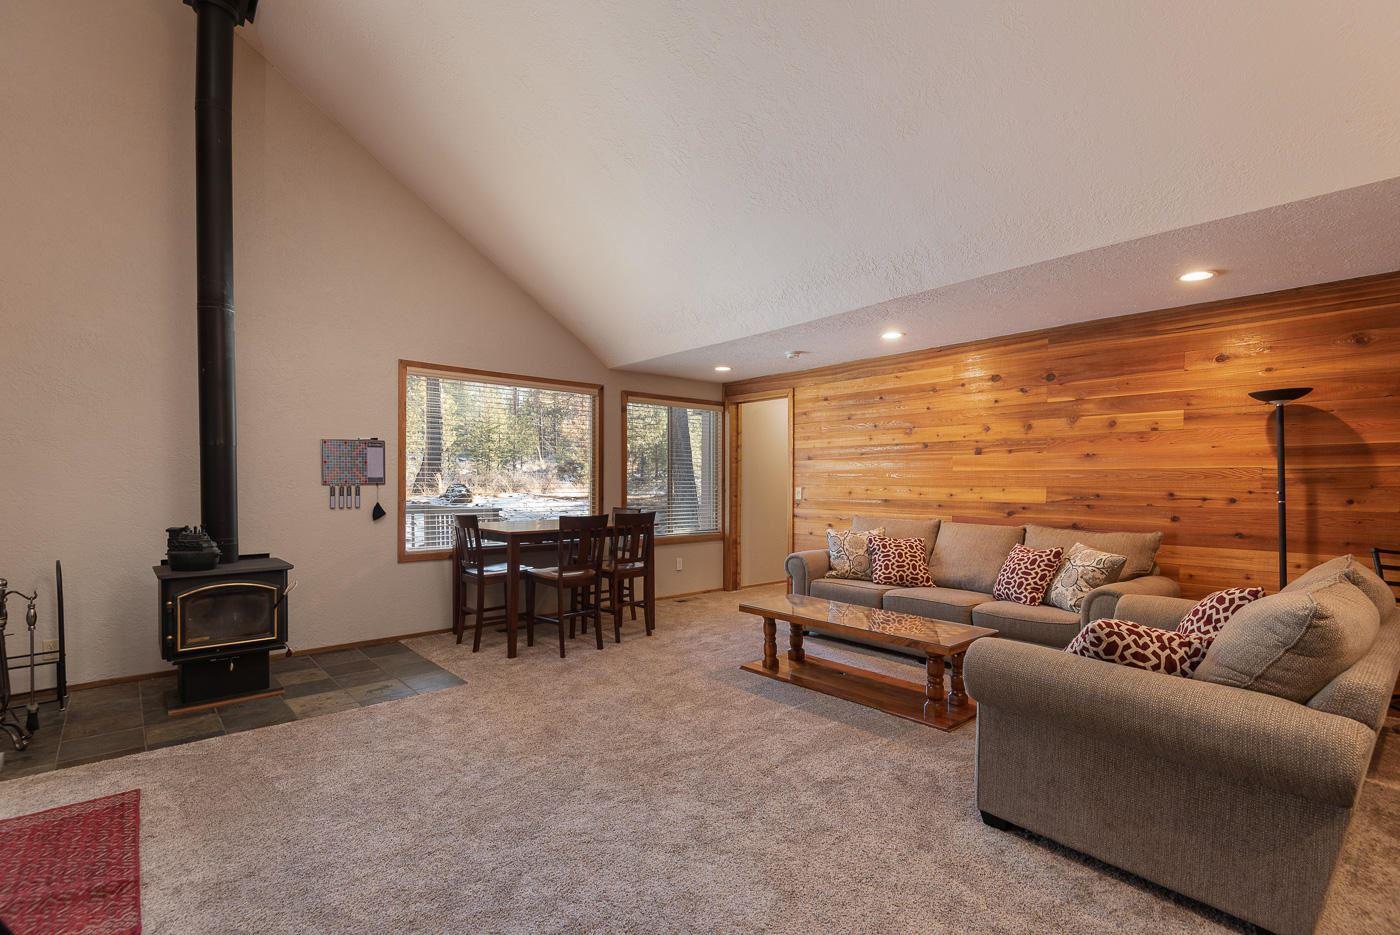 Photo of 57338 Sequoia Lane, Sunriver, OR 97707 (MLS # 220114994)